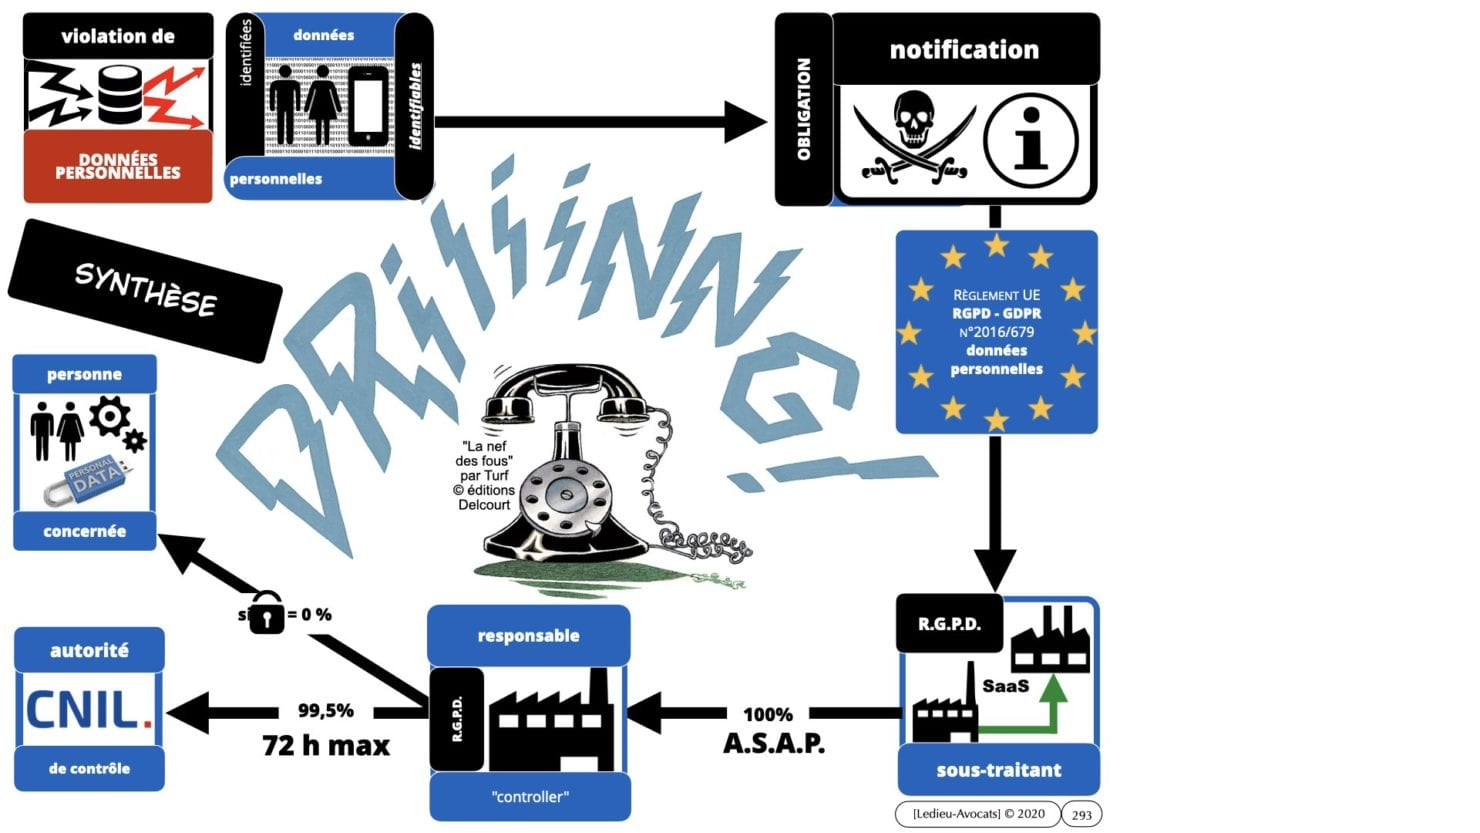 RGPD e-Privacy principes actualité jurisprudence ©Ledieu-Avocats 25-06-2021.293